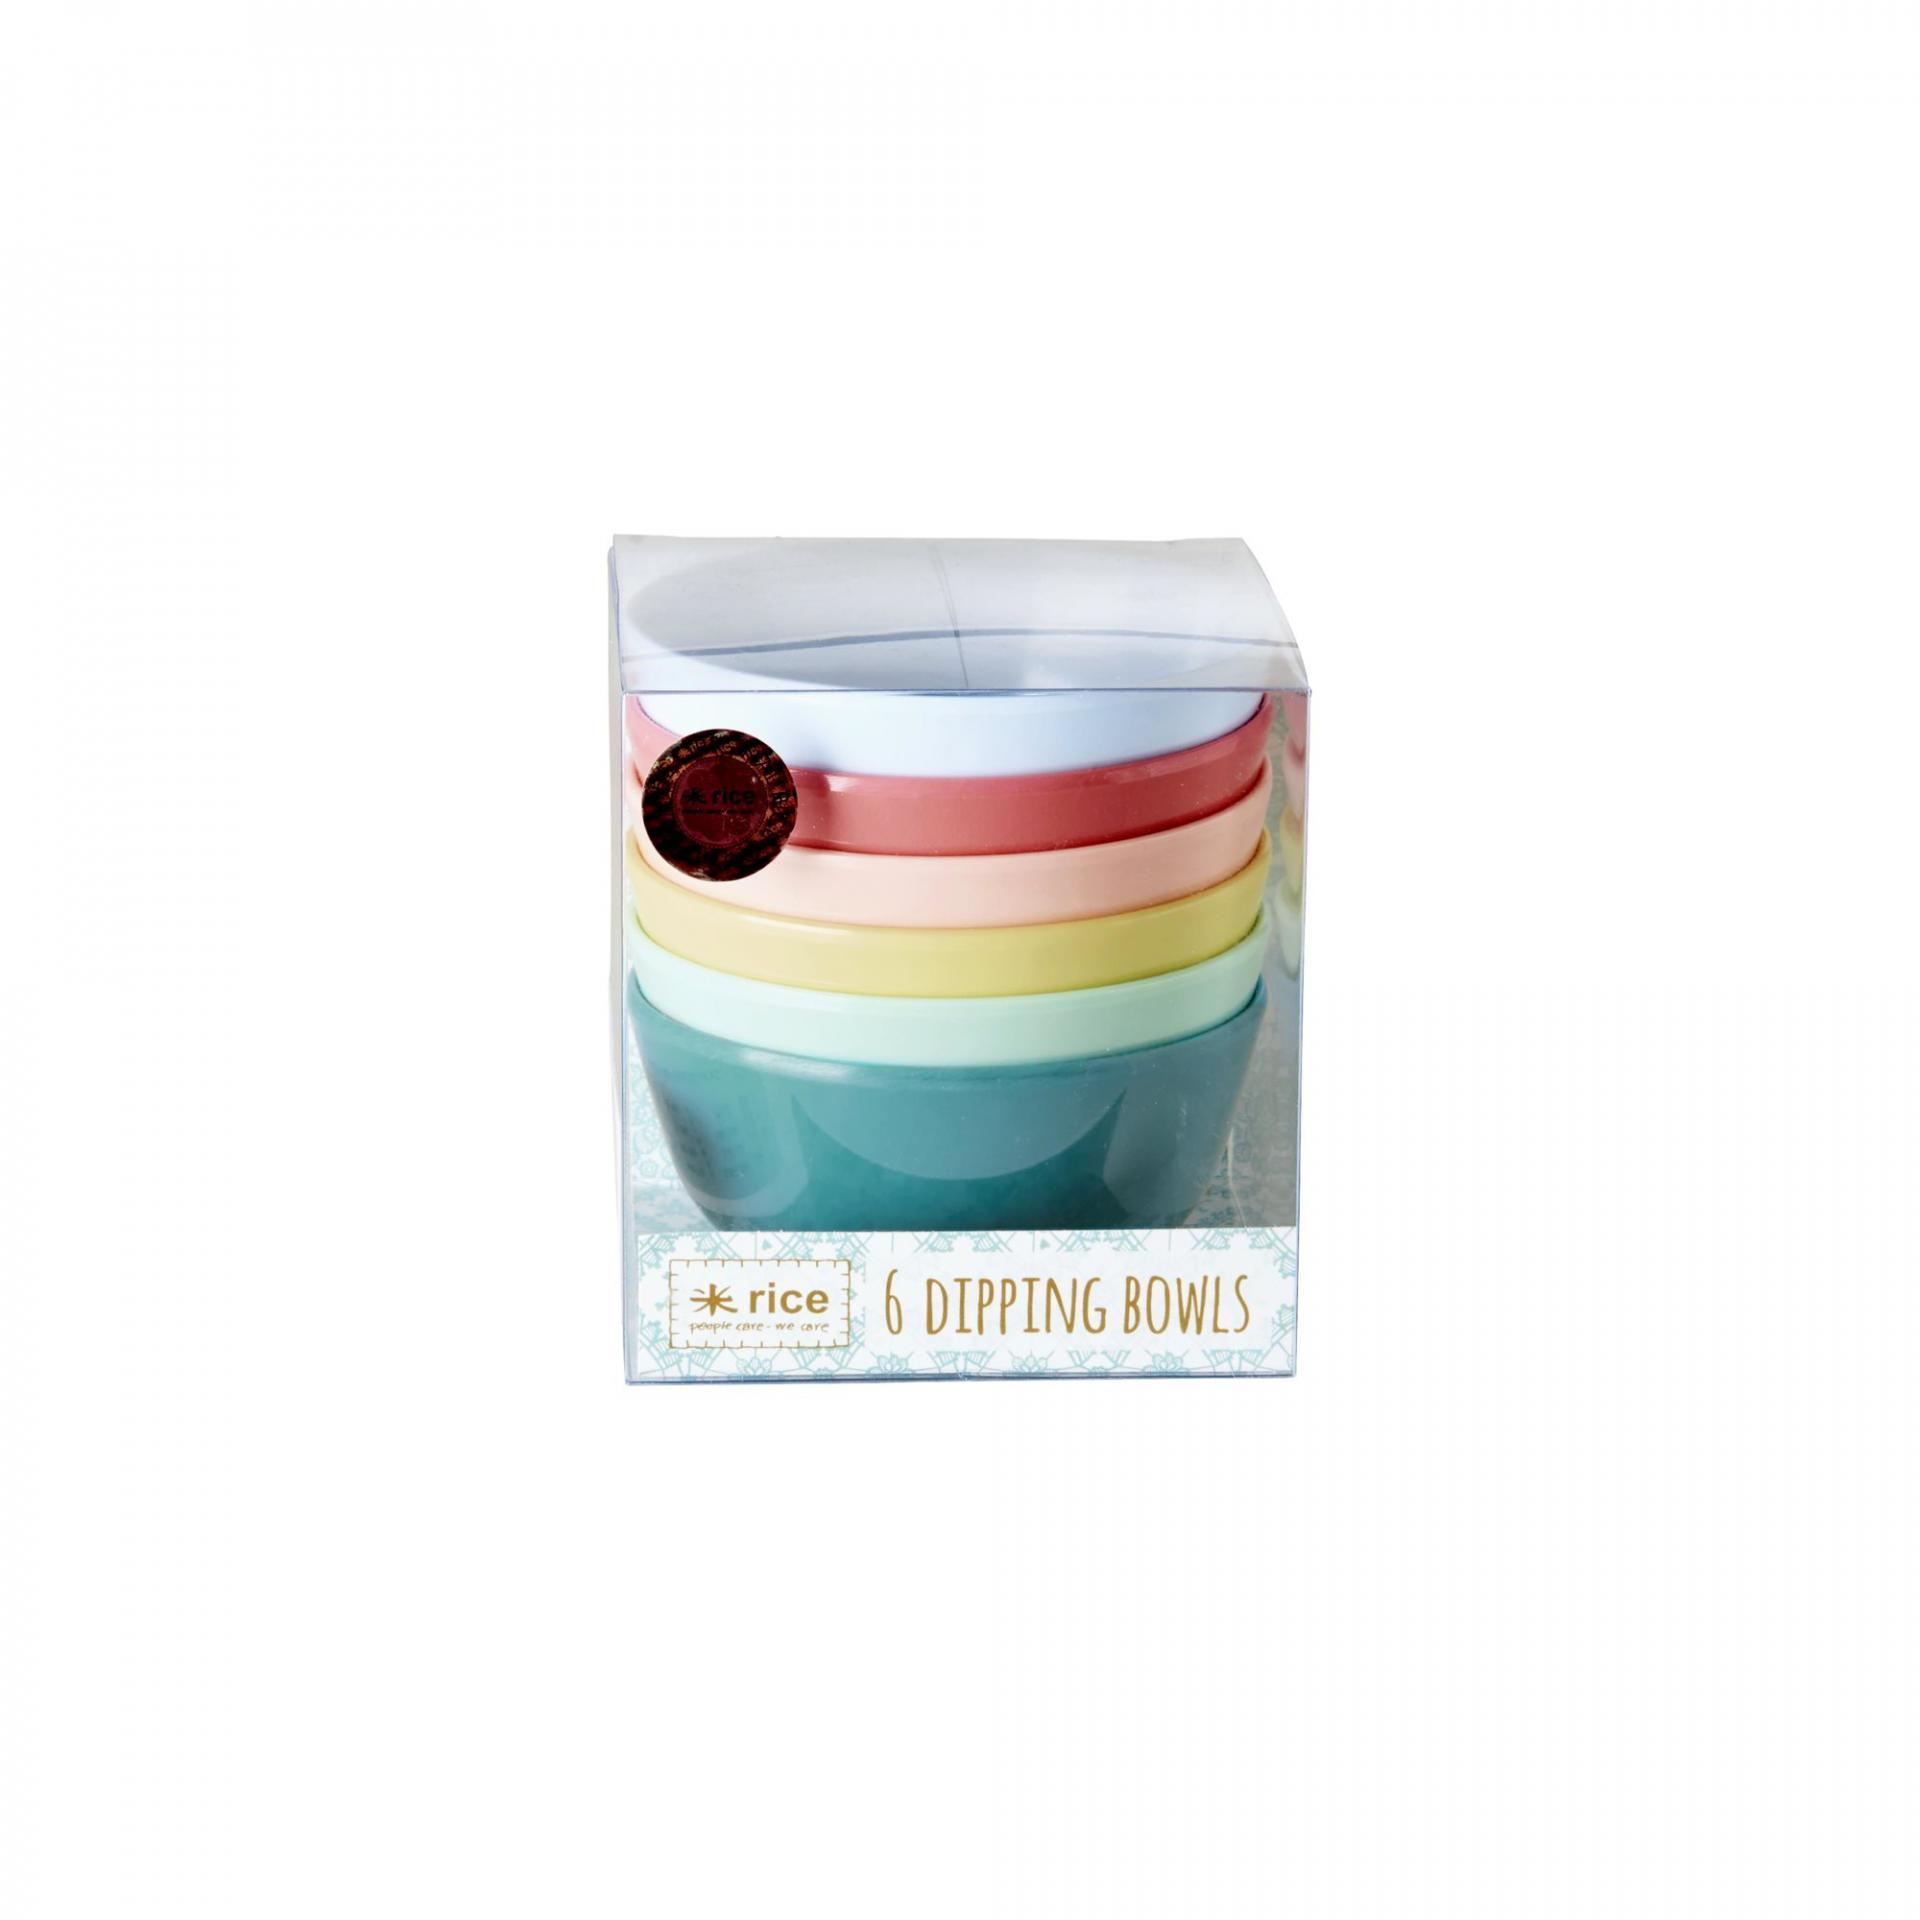 rice Barevné melaminové mističky - set 6 kusů, multi barva, melamin